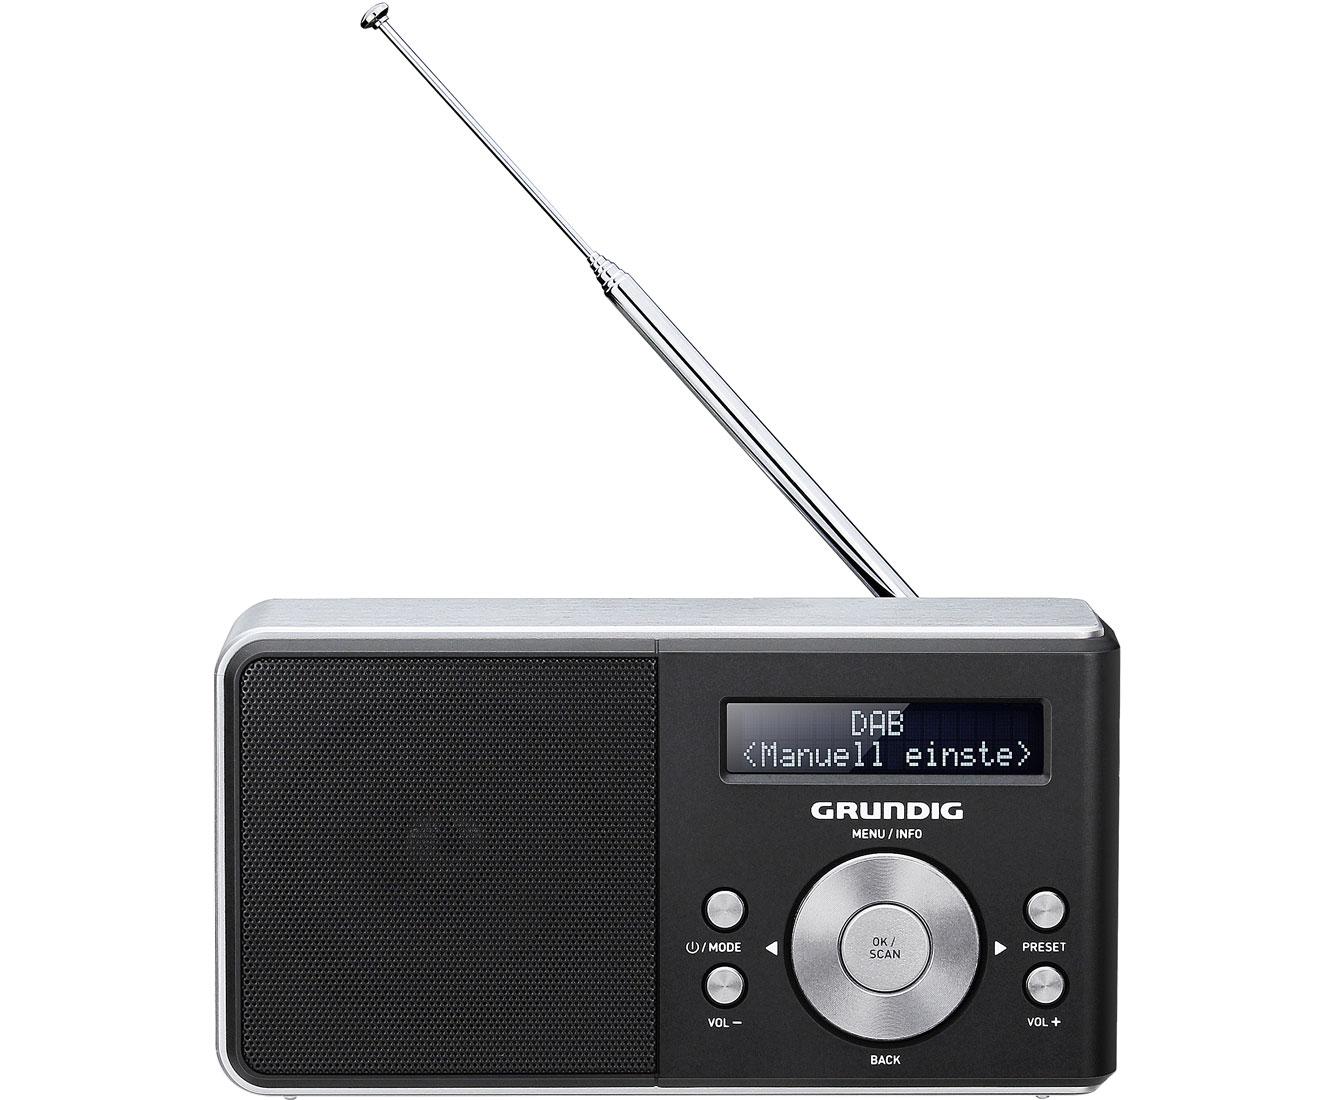 Grundig music dab radio schwarz